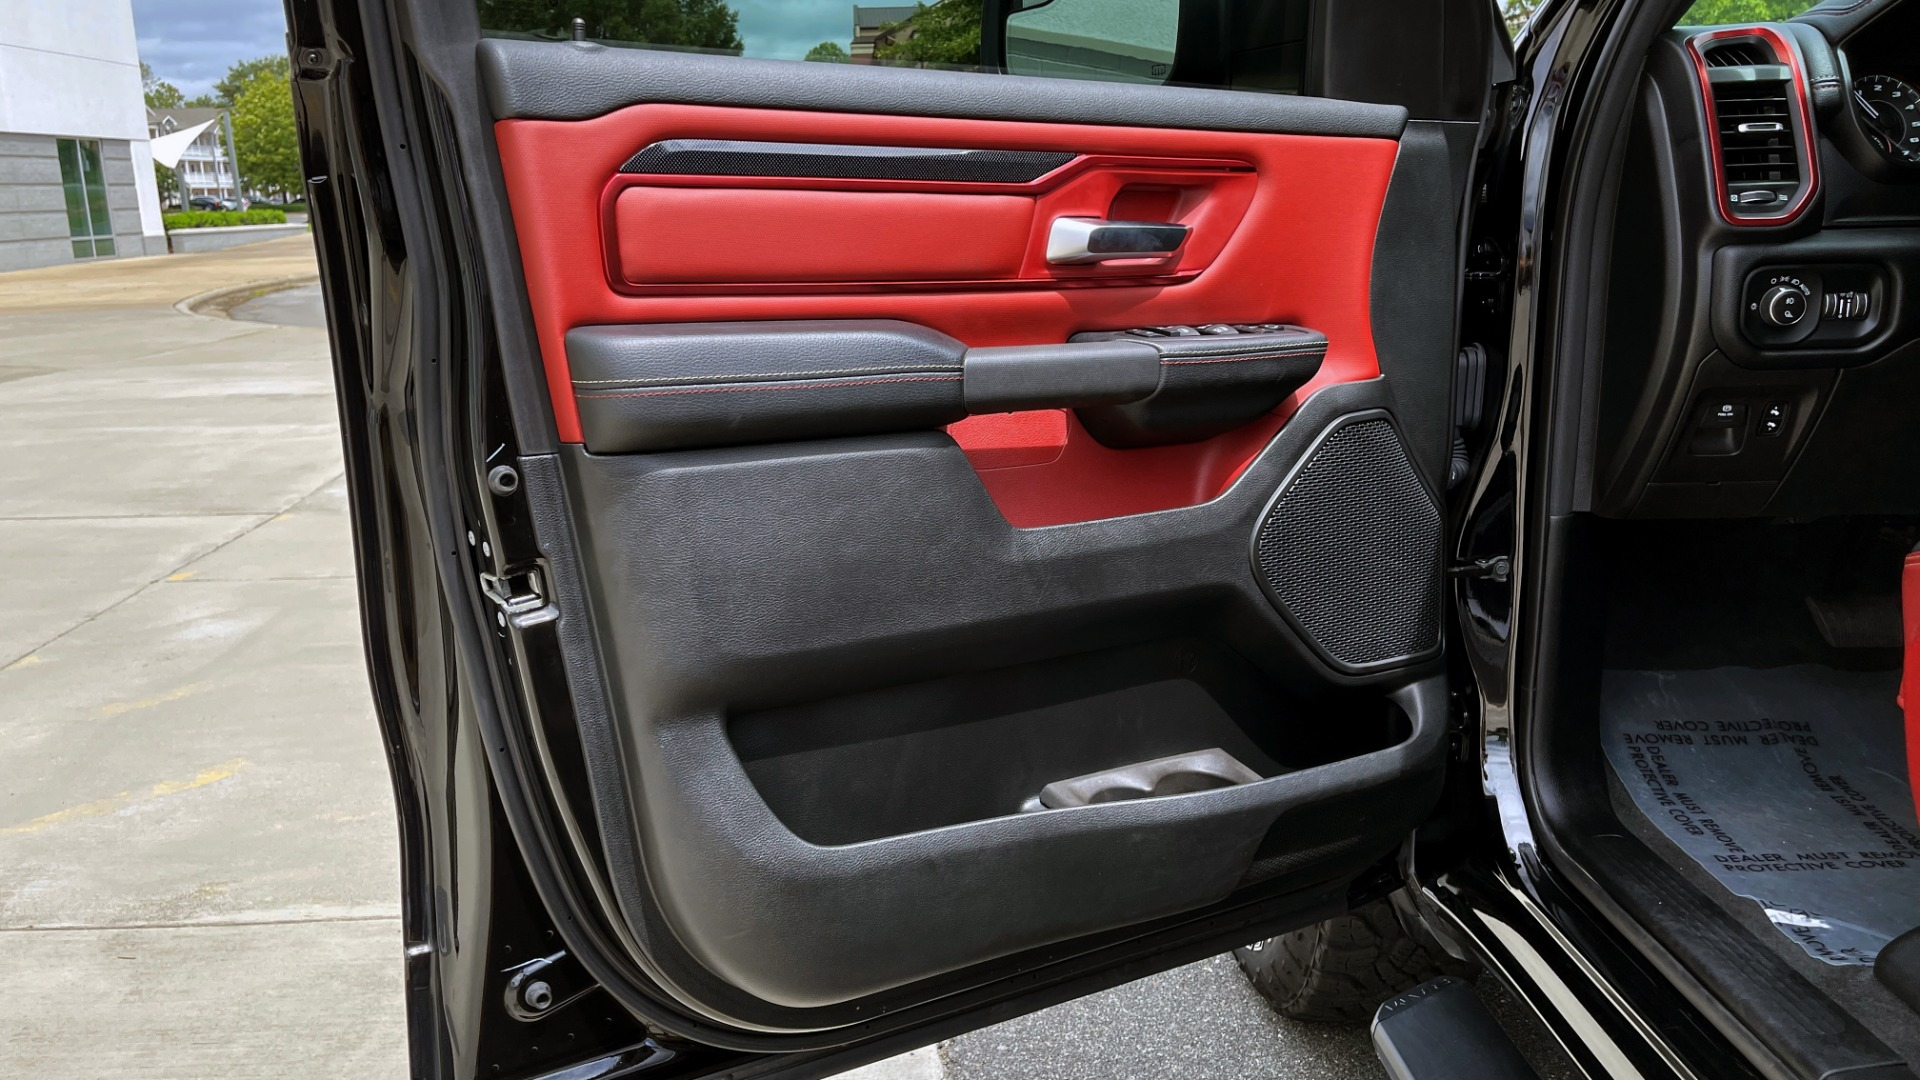 Used 2019 Ram 1500 REBEL QUADCAB 4X4 / 5.7L HEMI / 8-SPD AUTO / REMOTE START / PARK ASSIST for sale $44,495 at Formula Imports in Charlotte NC 28227 27